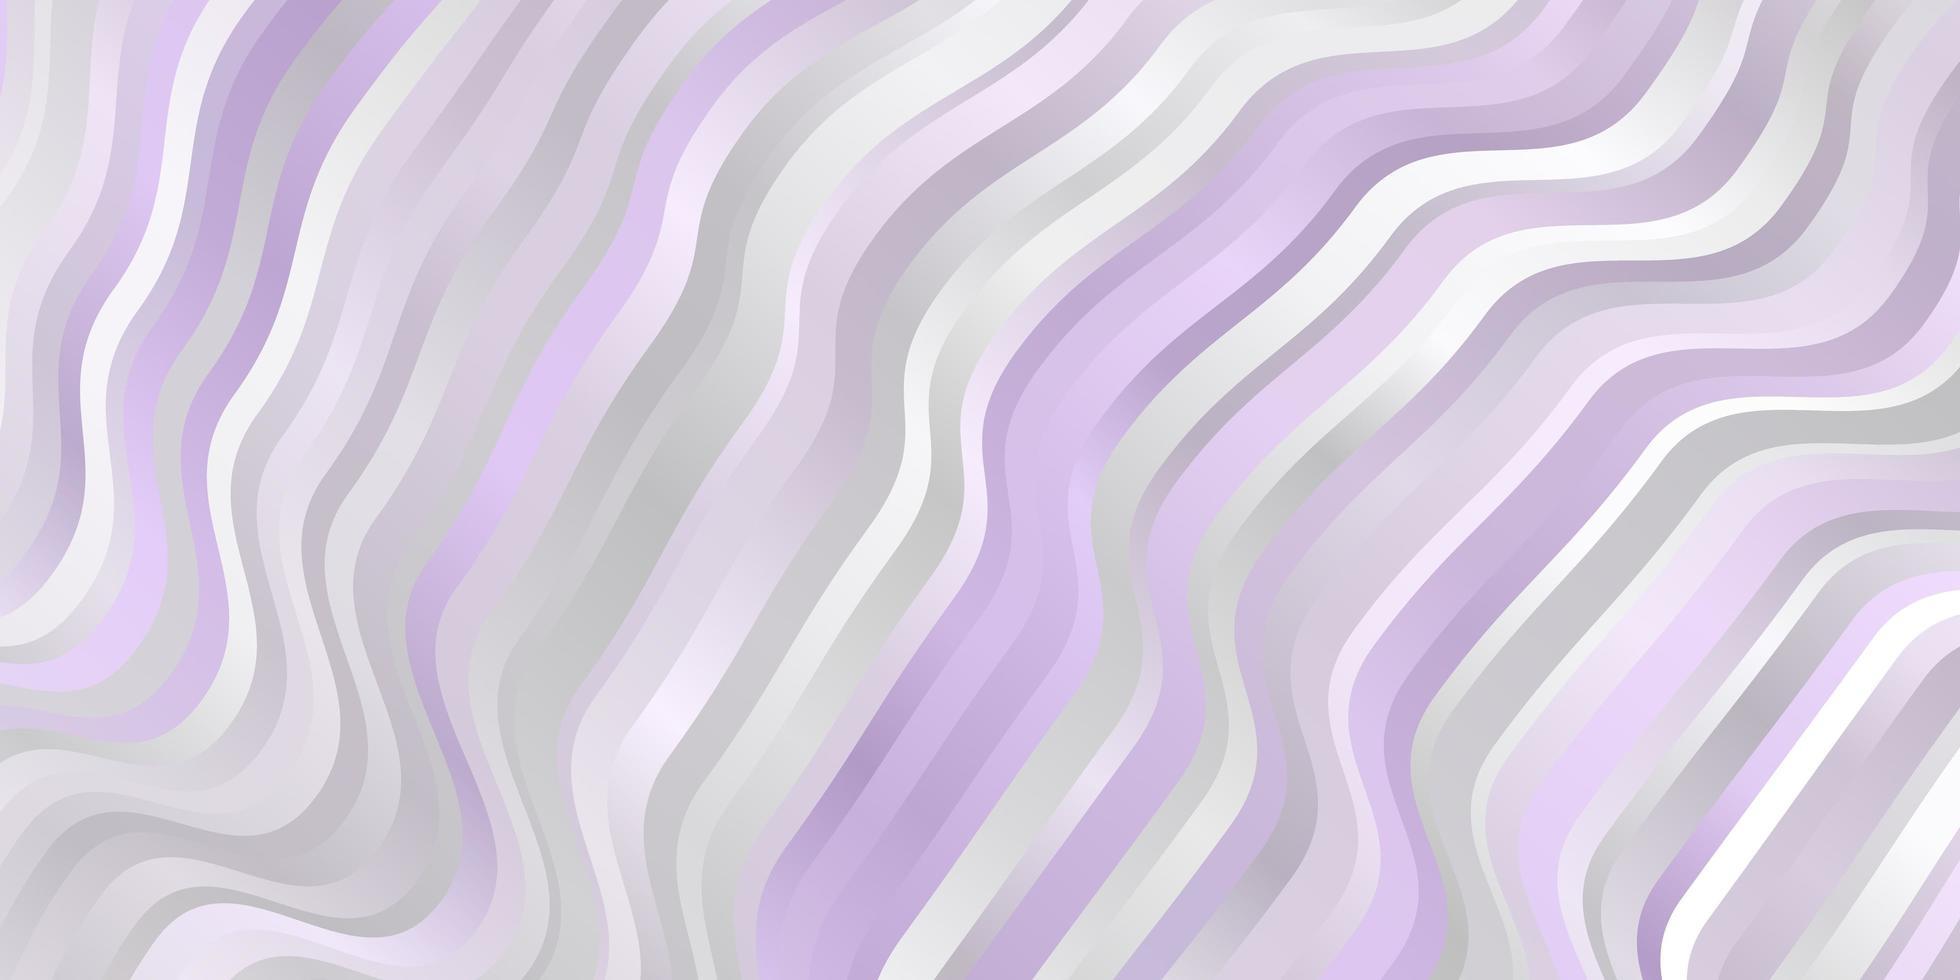 ljuslila vektormall med böjda linjer. vektor